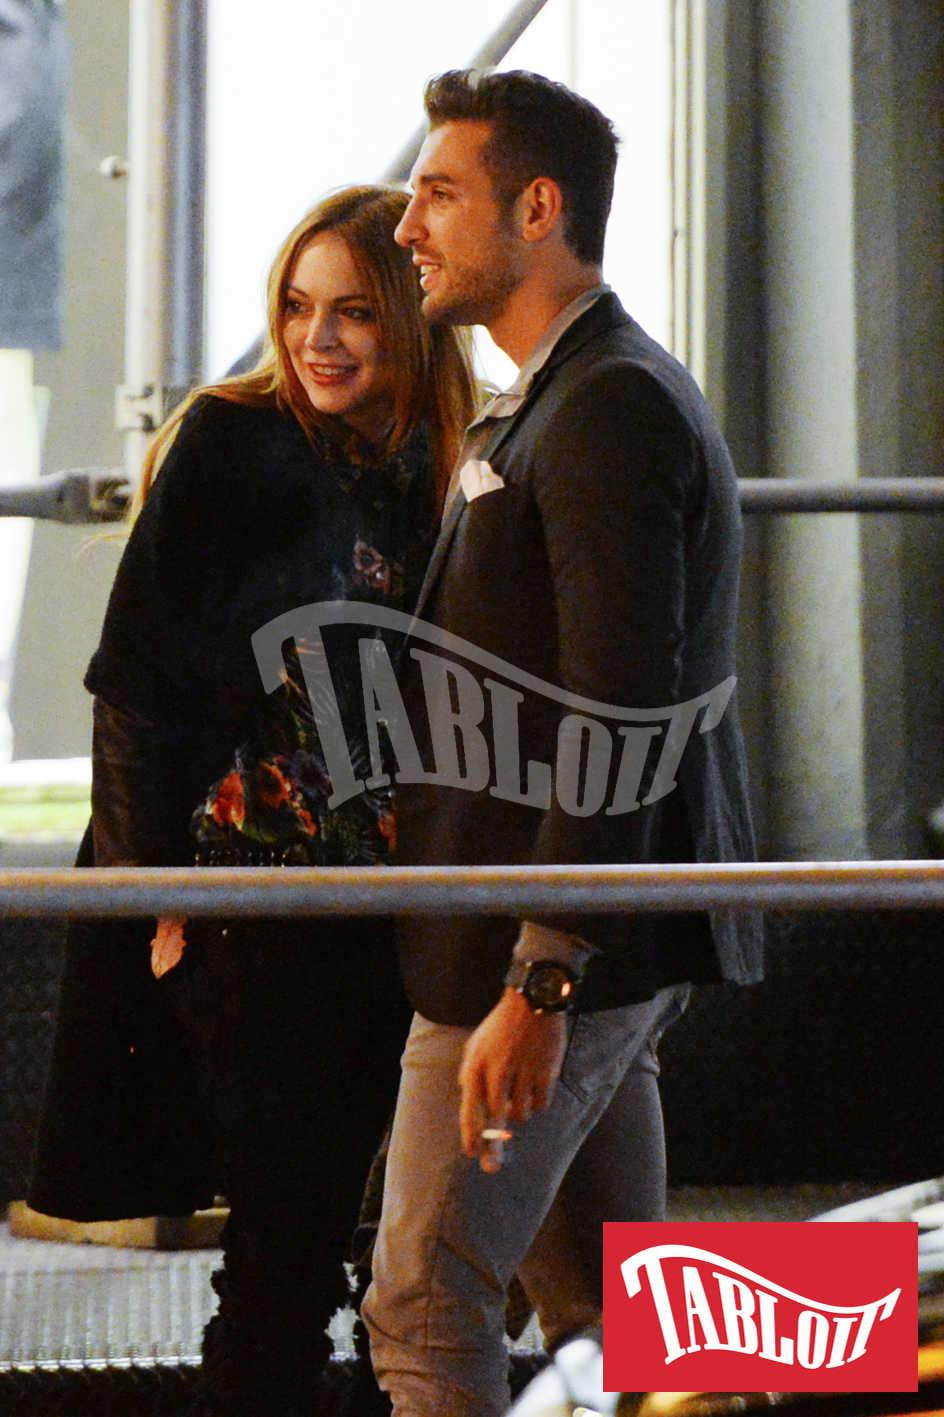 Tommy Chiabra nel 2014 a New York con Lindsay Lohan